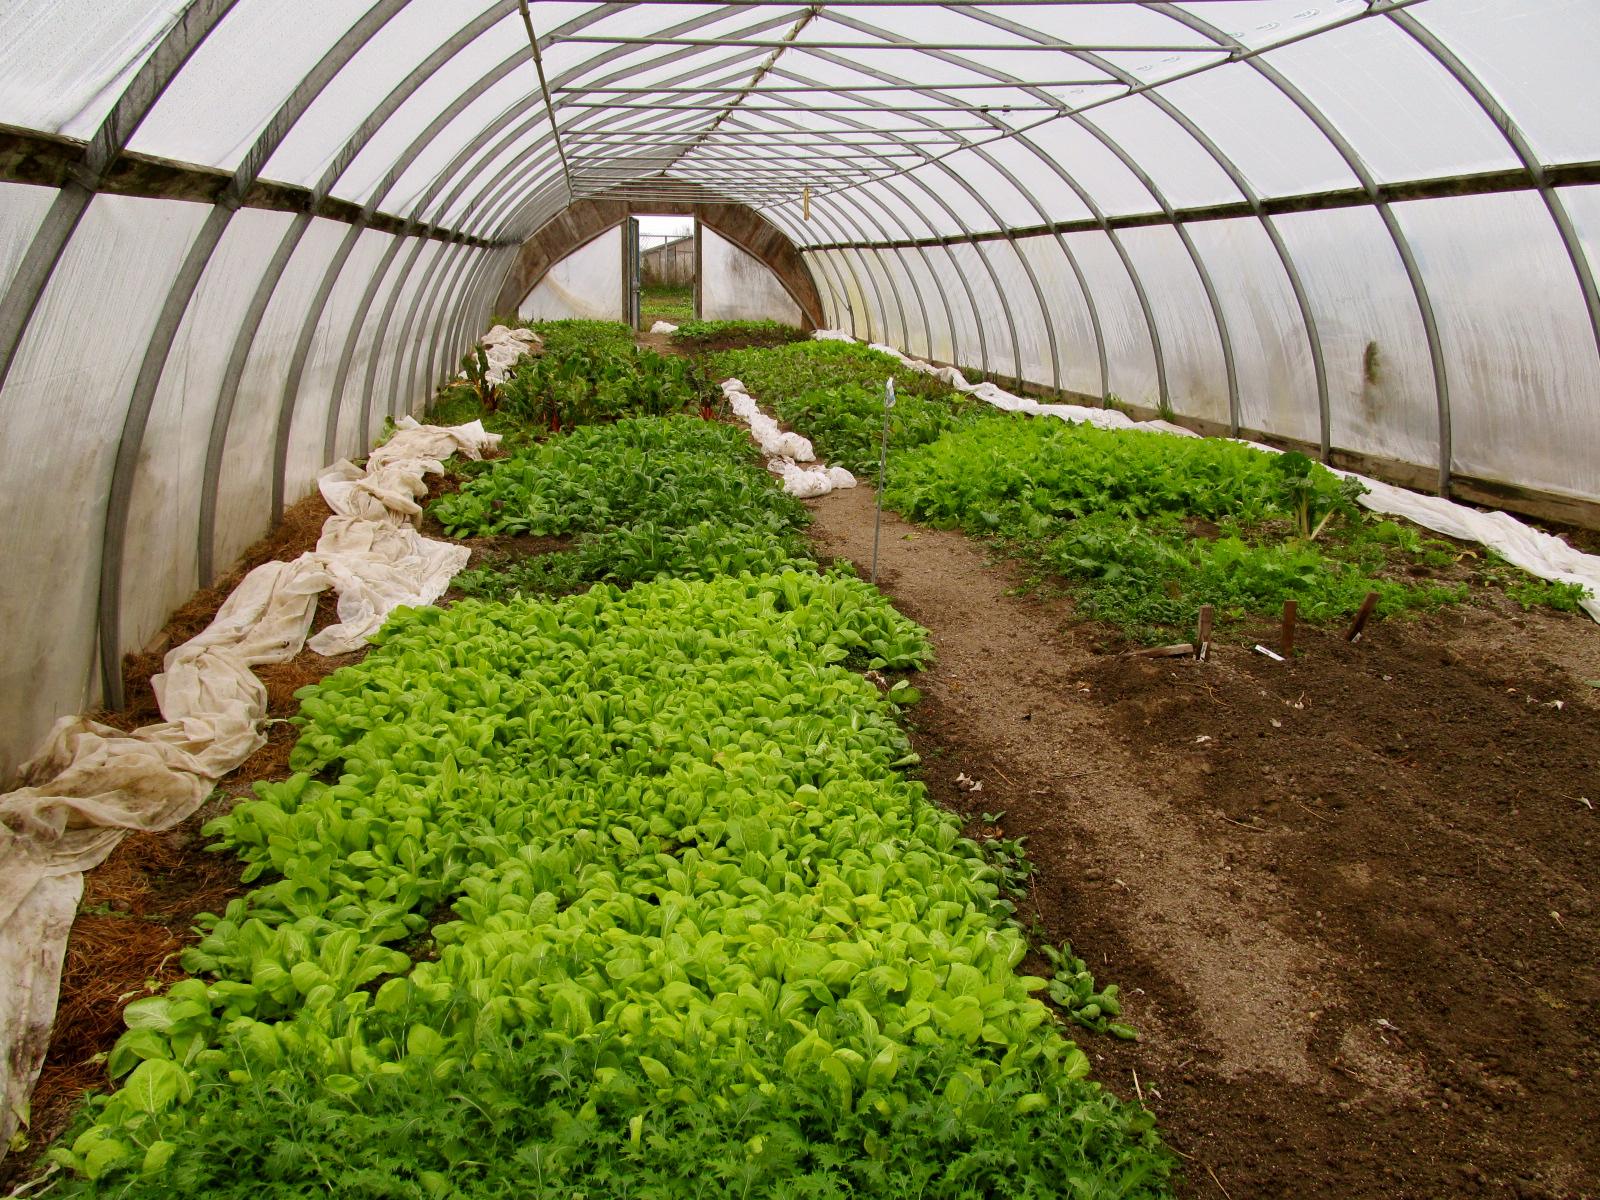 Tree And Twig Farm Blog Csa Week 9 And Beet And Arugula Salad